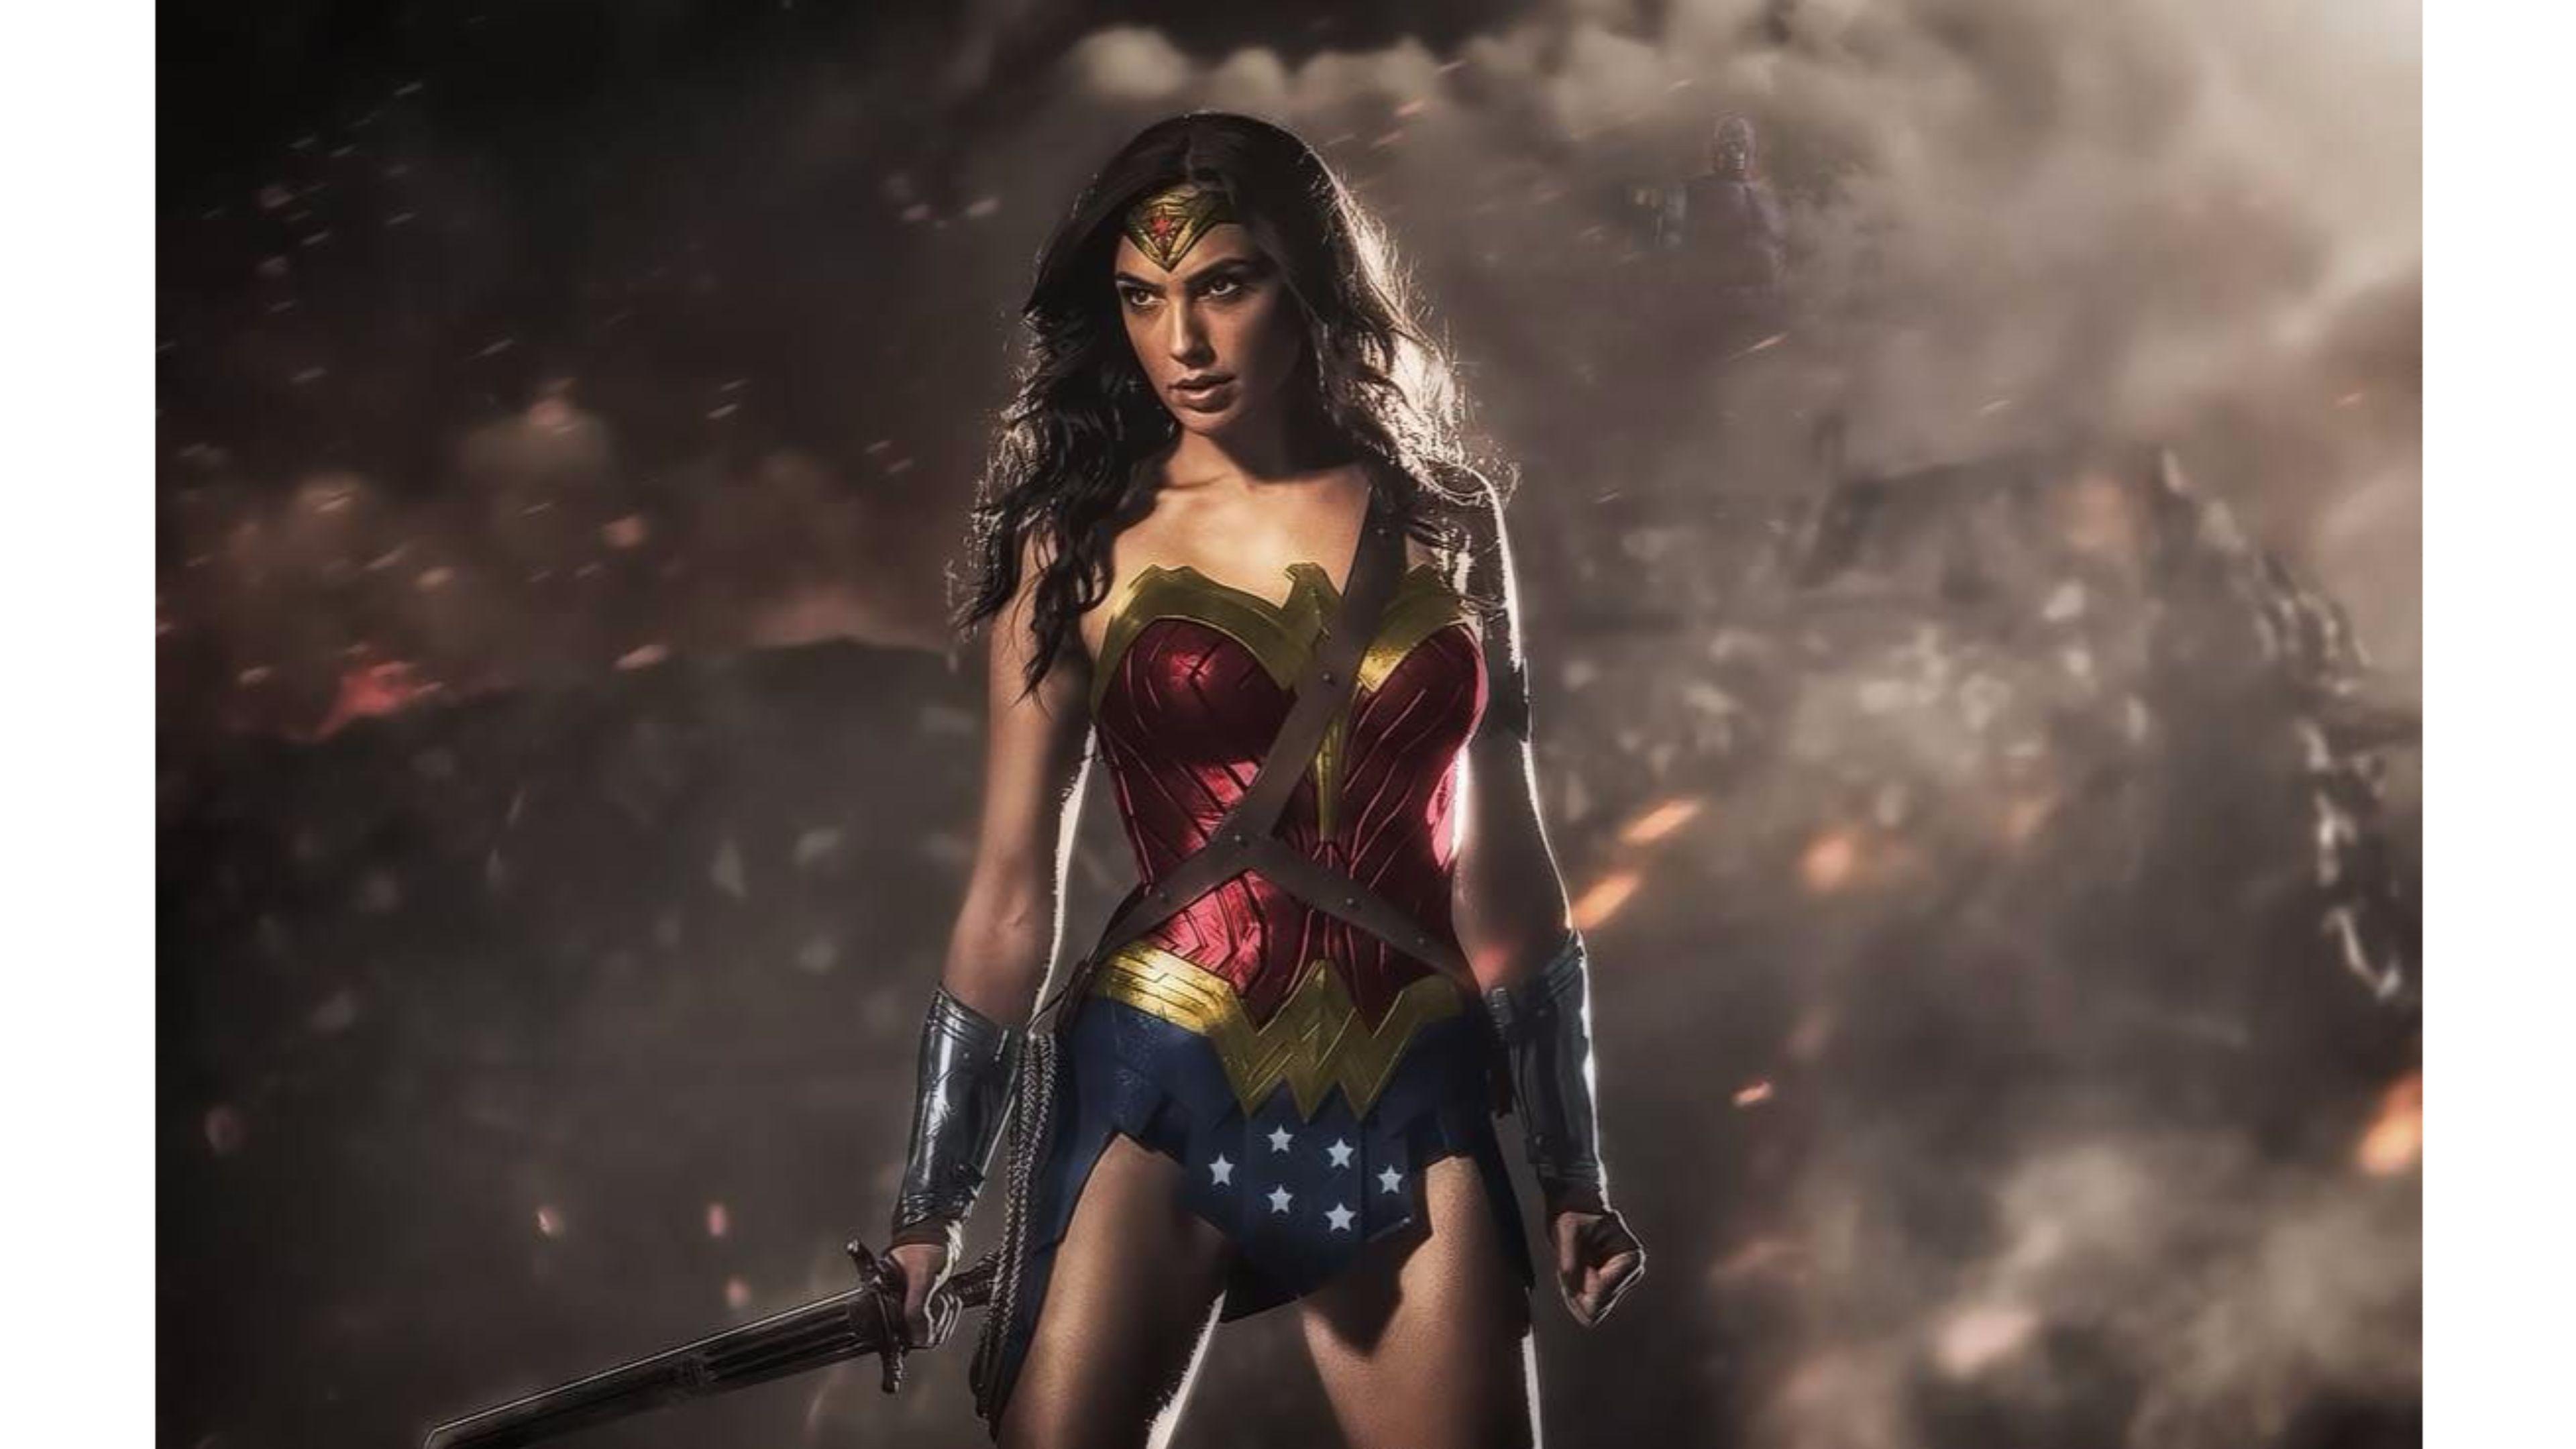 Wonder Woman Wallpaper Full Hd ~ Sdeerwallpaper